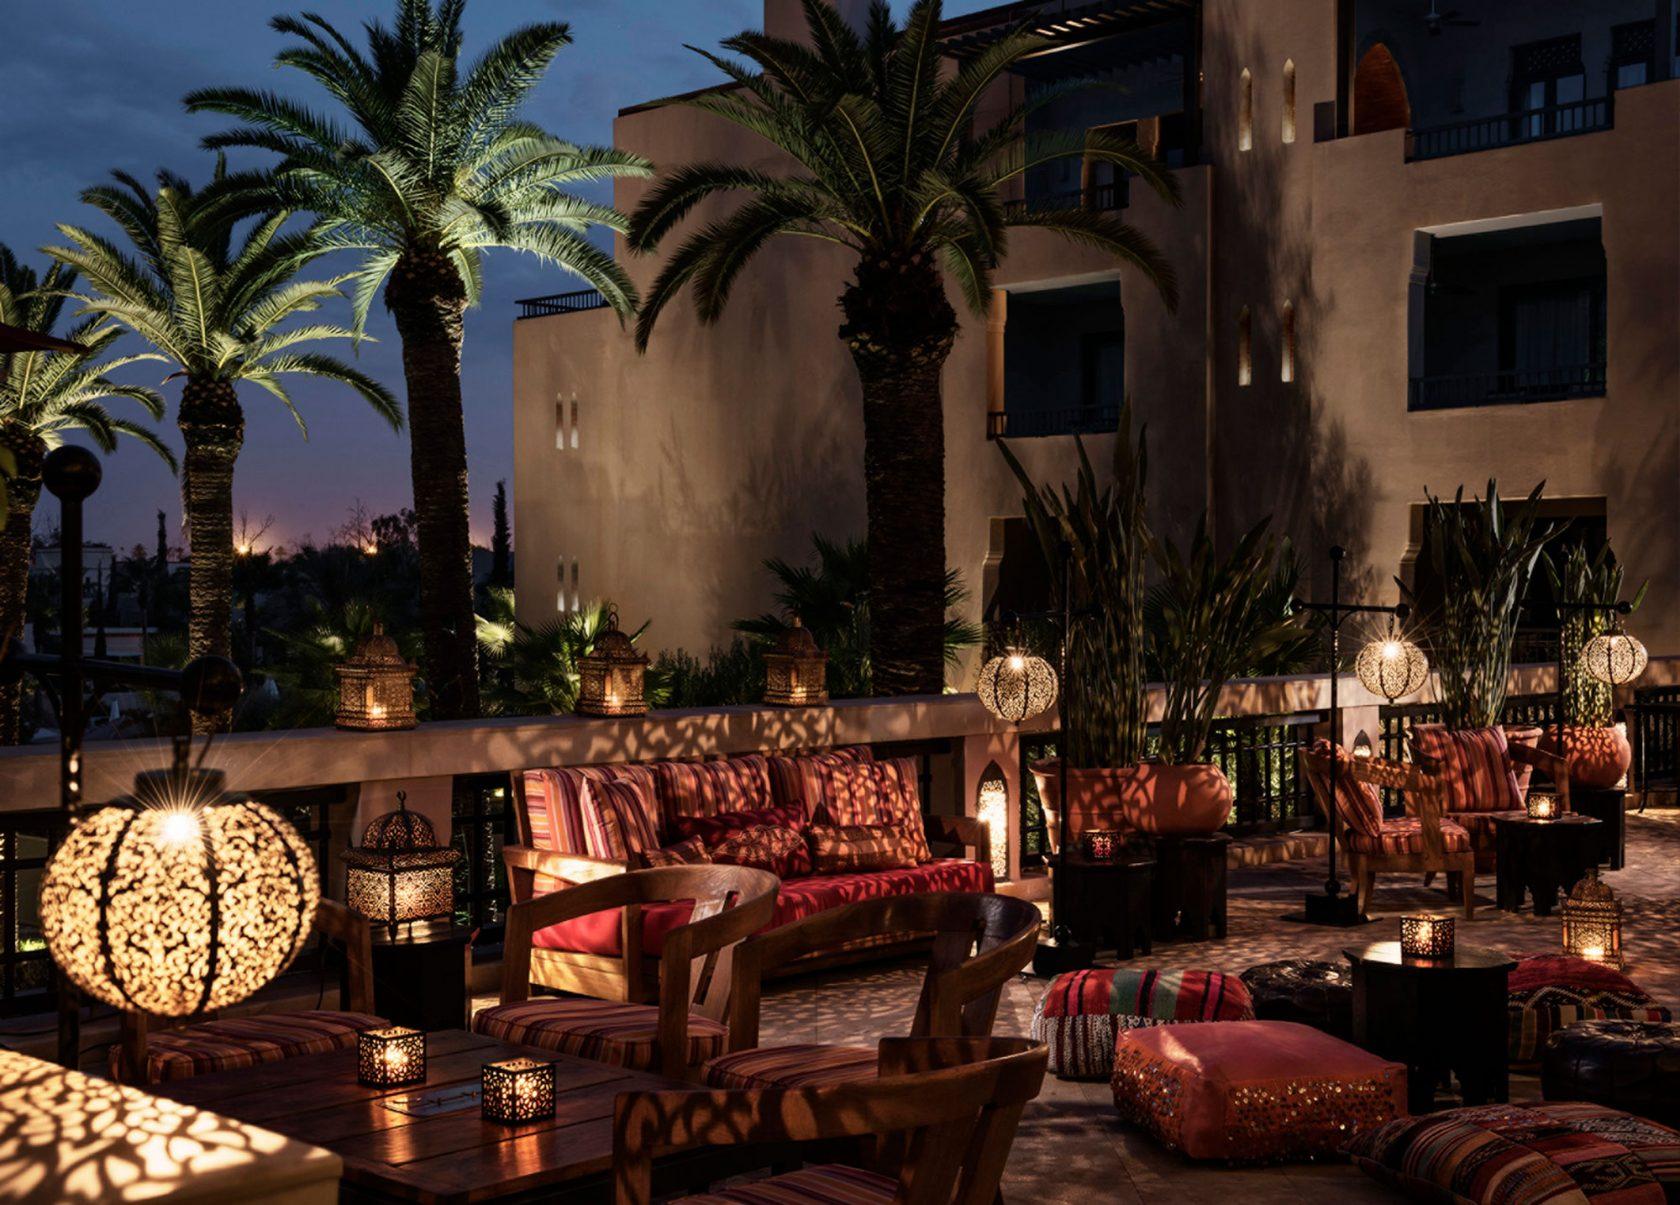 Four Seasons Marrakesch by night